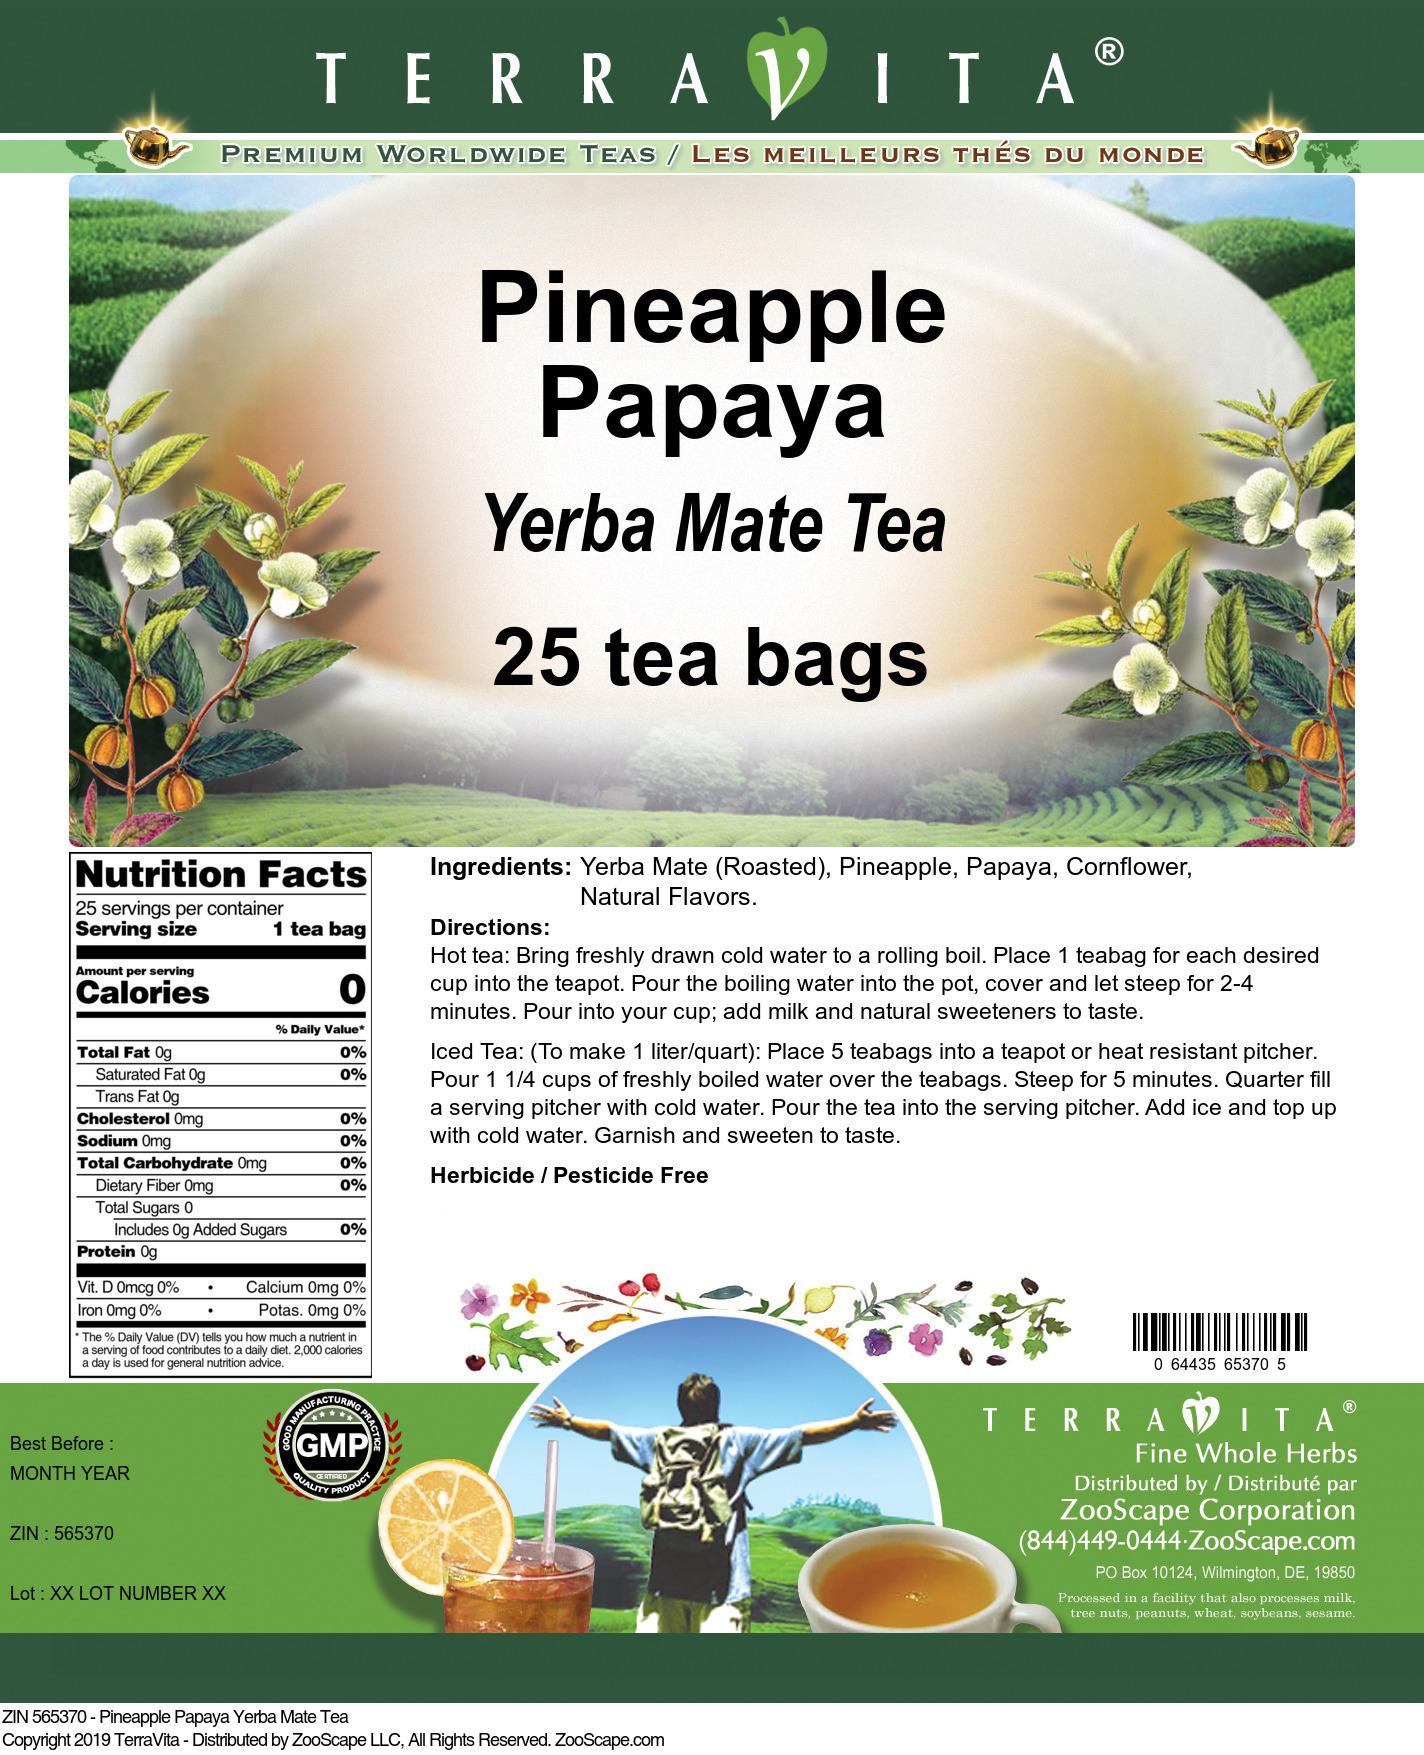 Pineapple Papaya Yerba Mate Tea